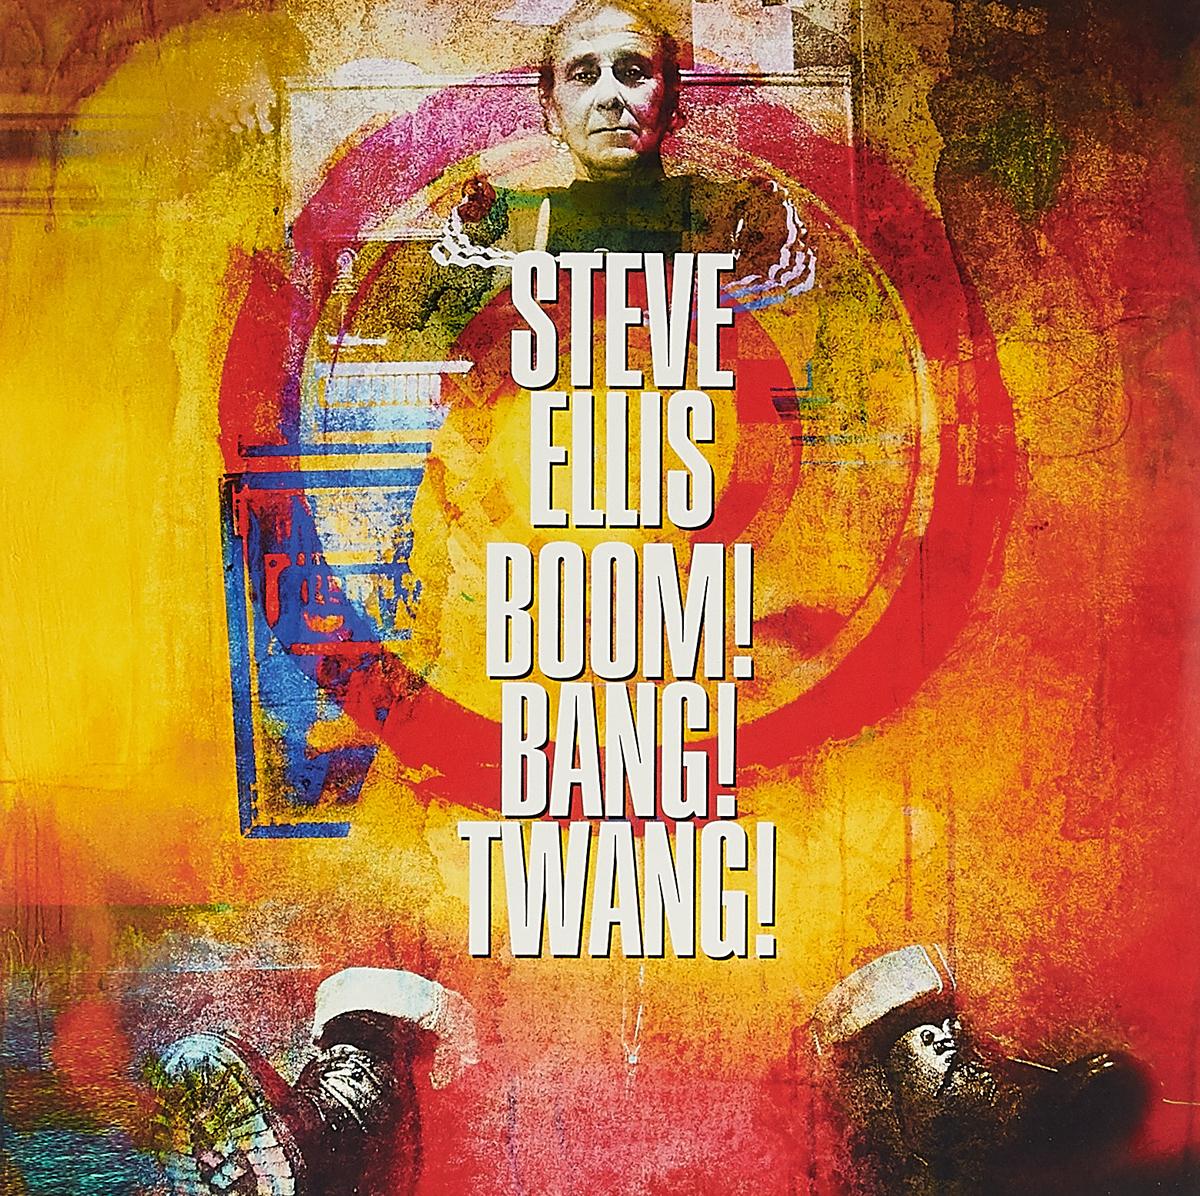 Steve Ellis Steve Ellis. Boom! Bang! Twang! (LP) 10pcs professional magnetic nut driver set metric socket 1 4 hex power drill bits 6mm 15mm hex socket sleeve adapter power tool